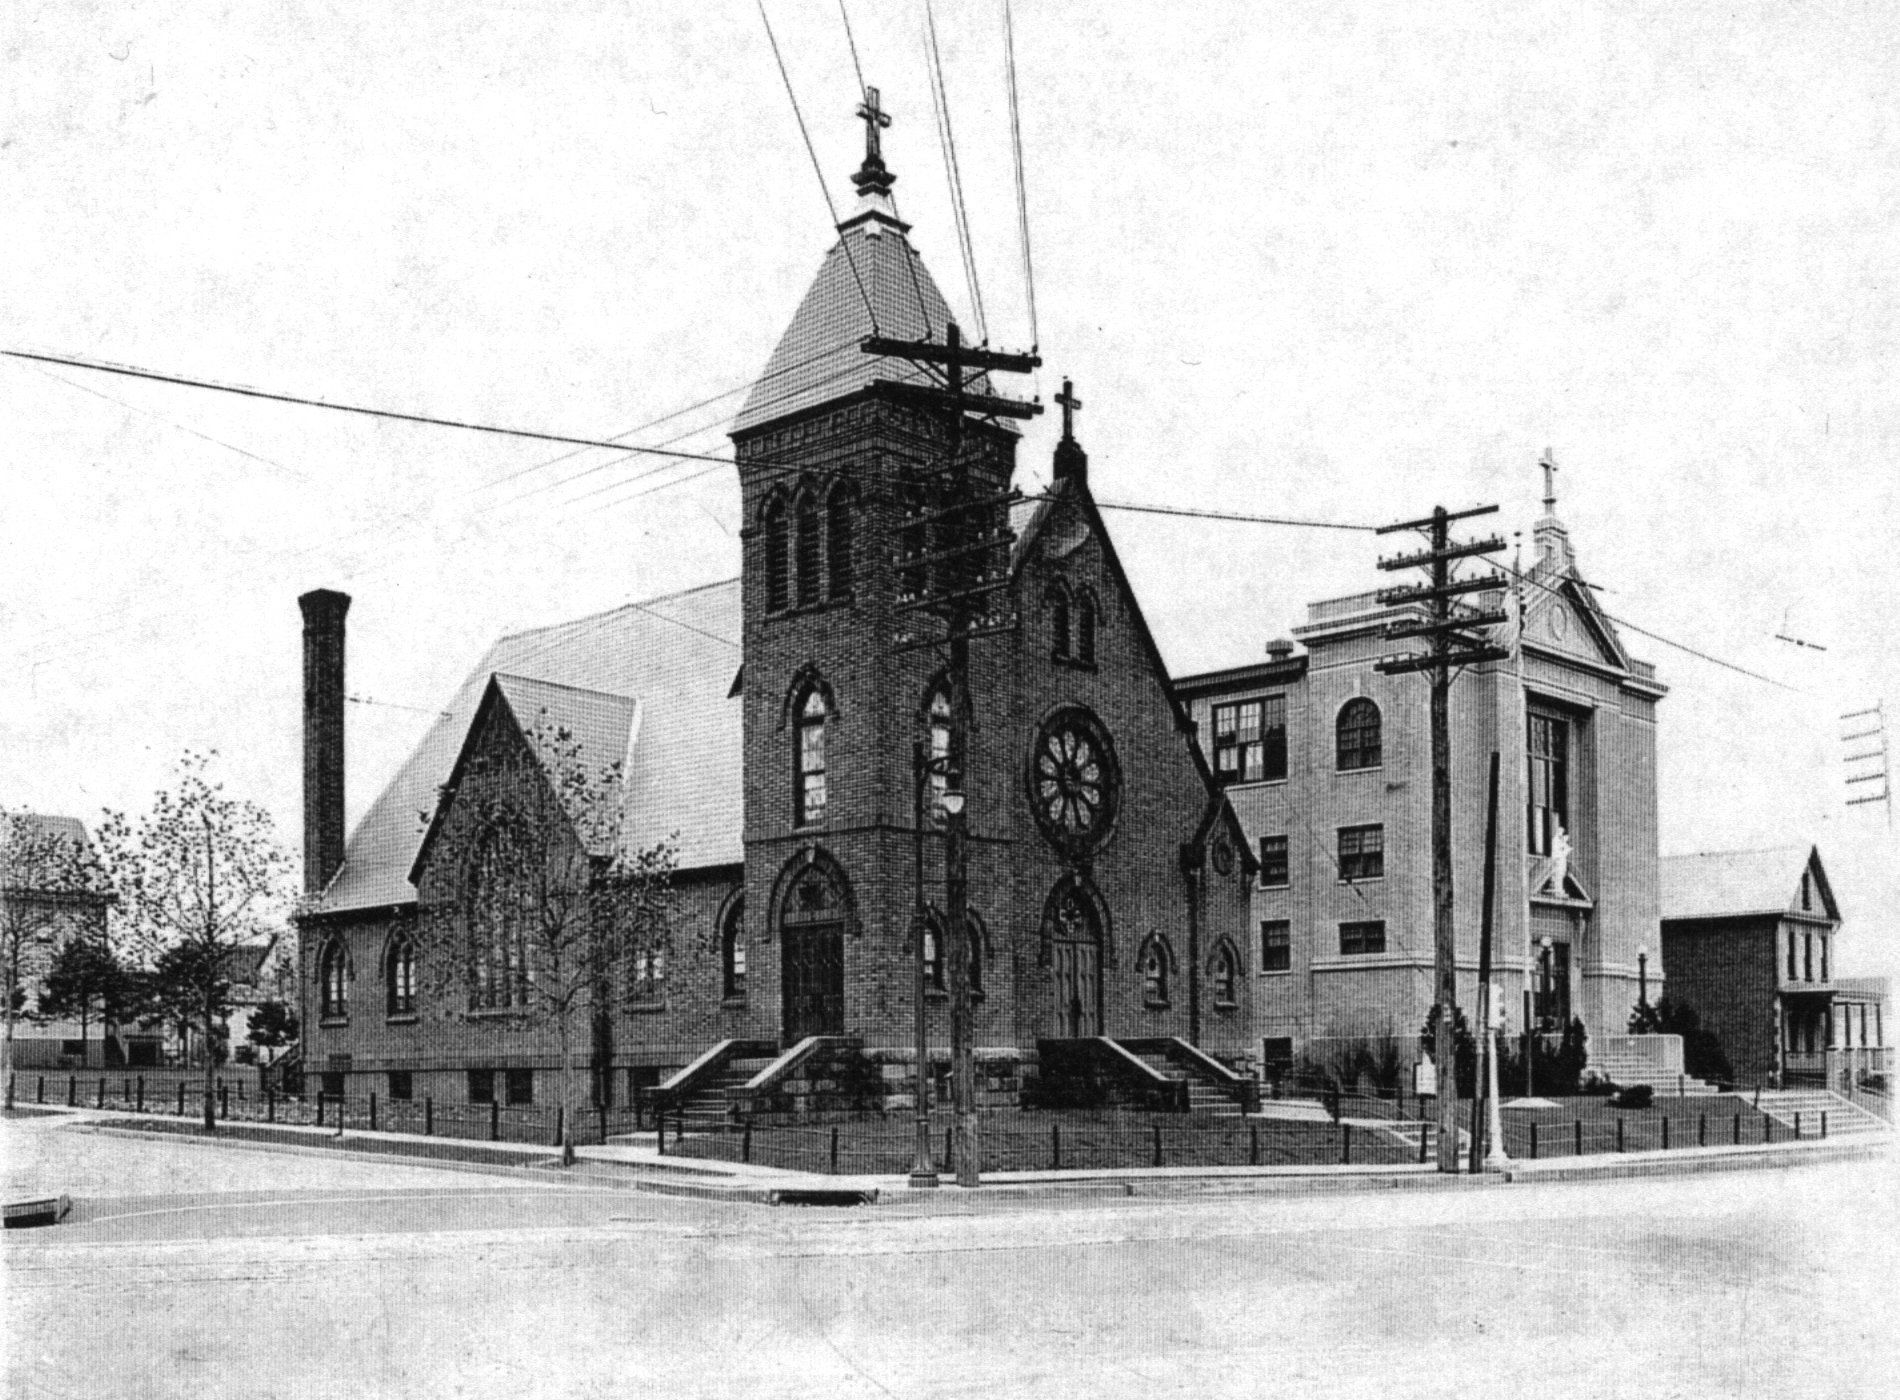 Church, school, and the original rectory c. 1928